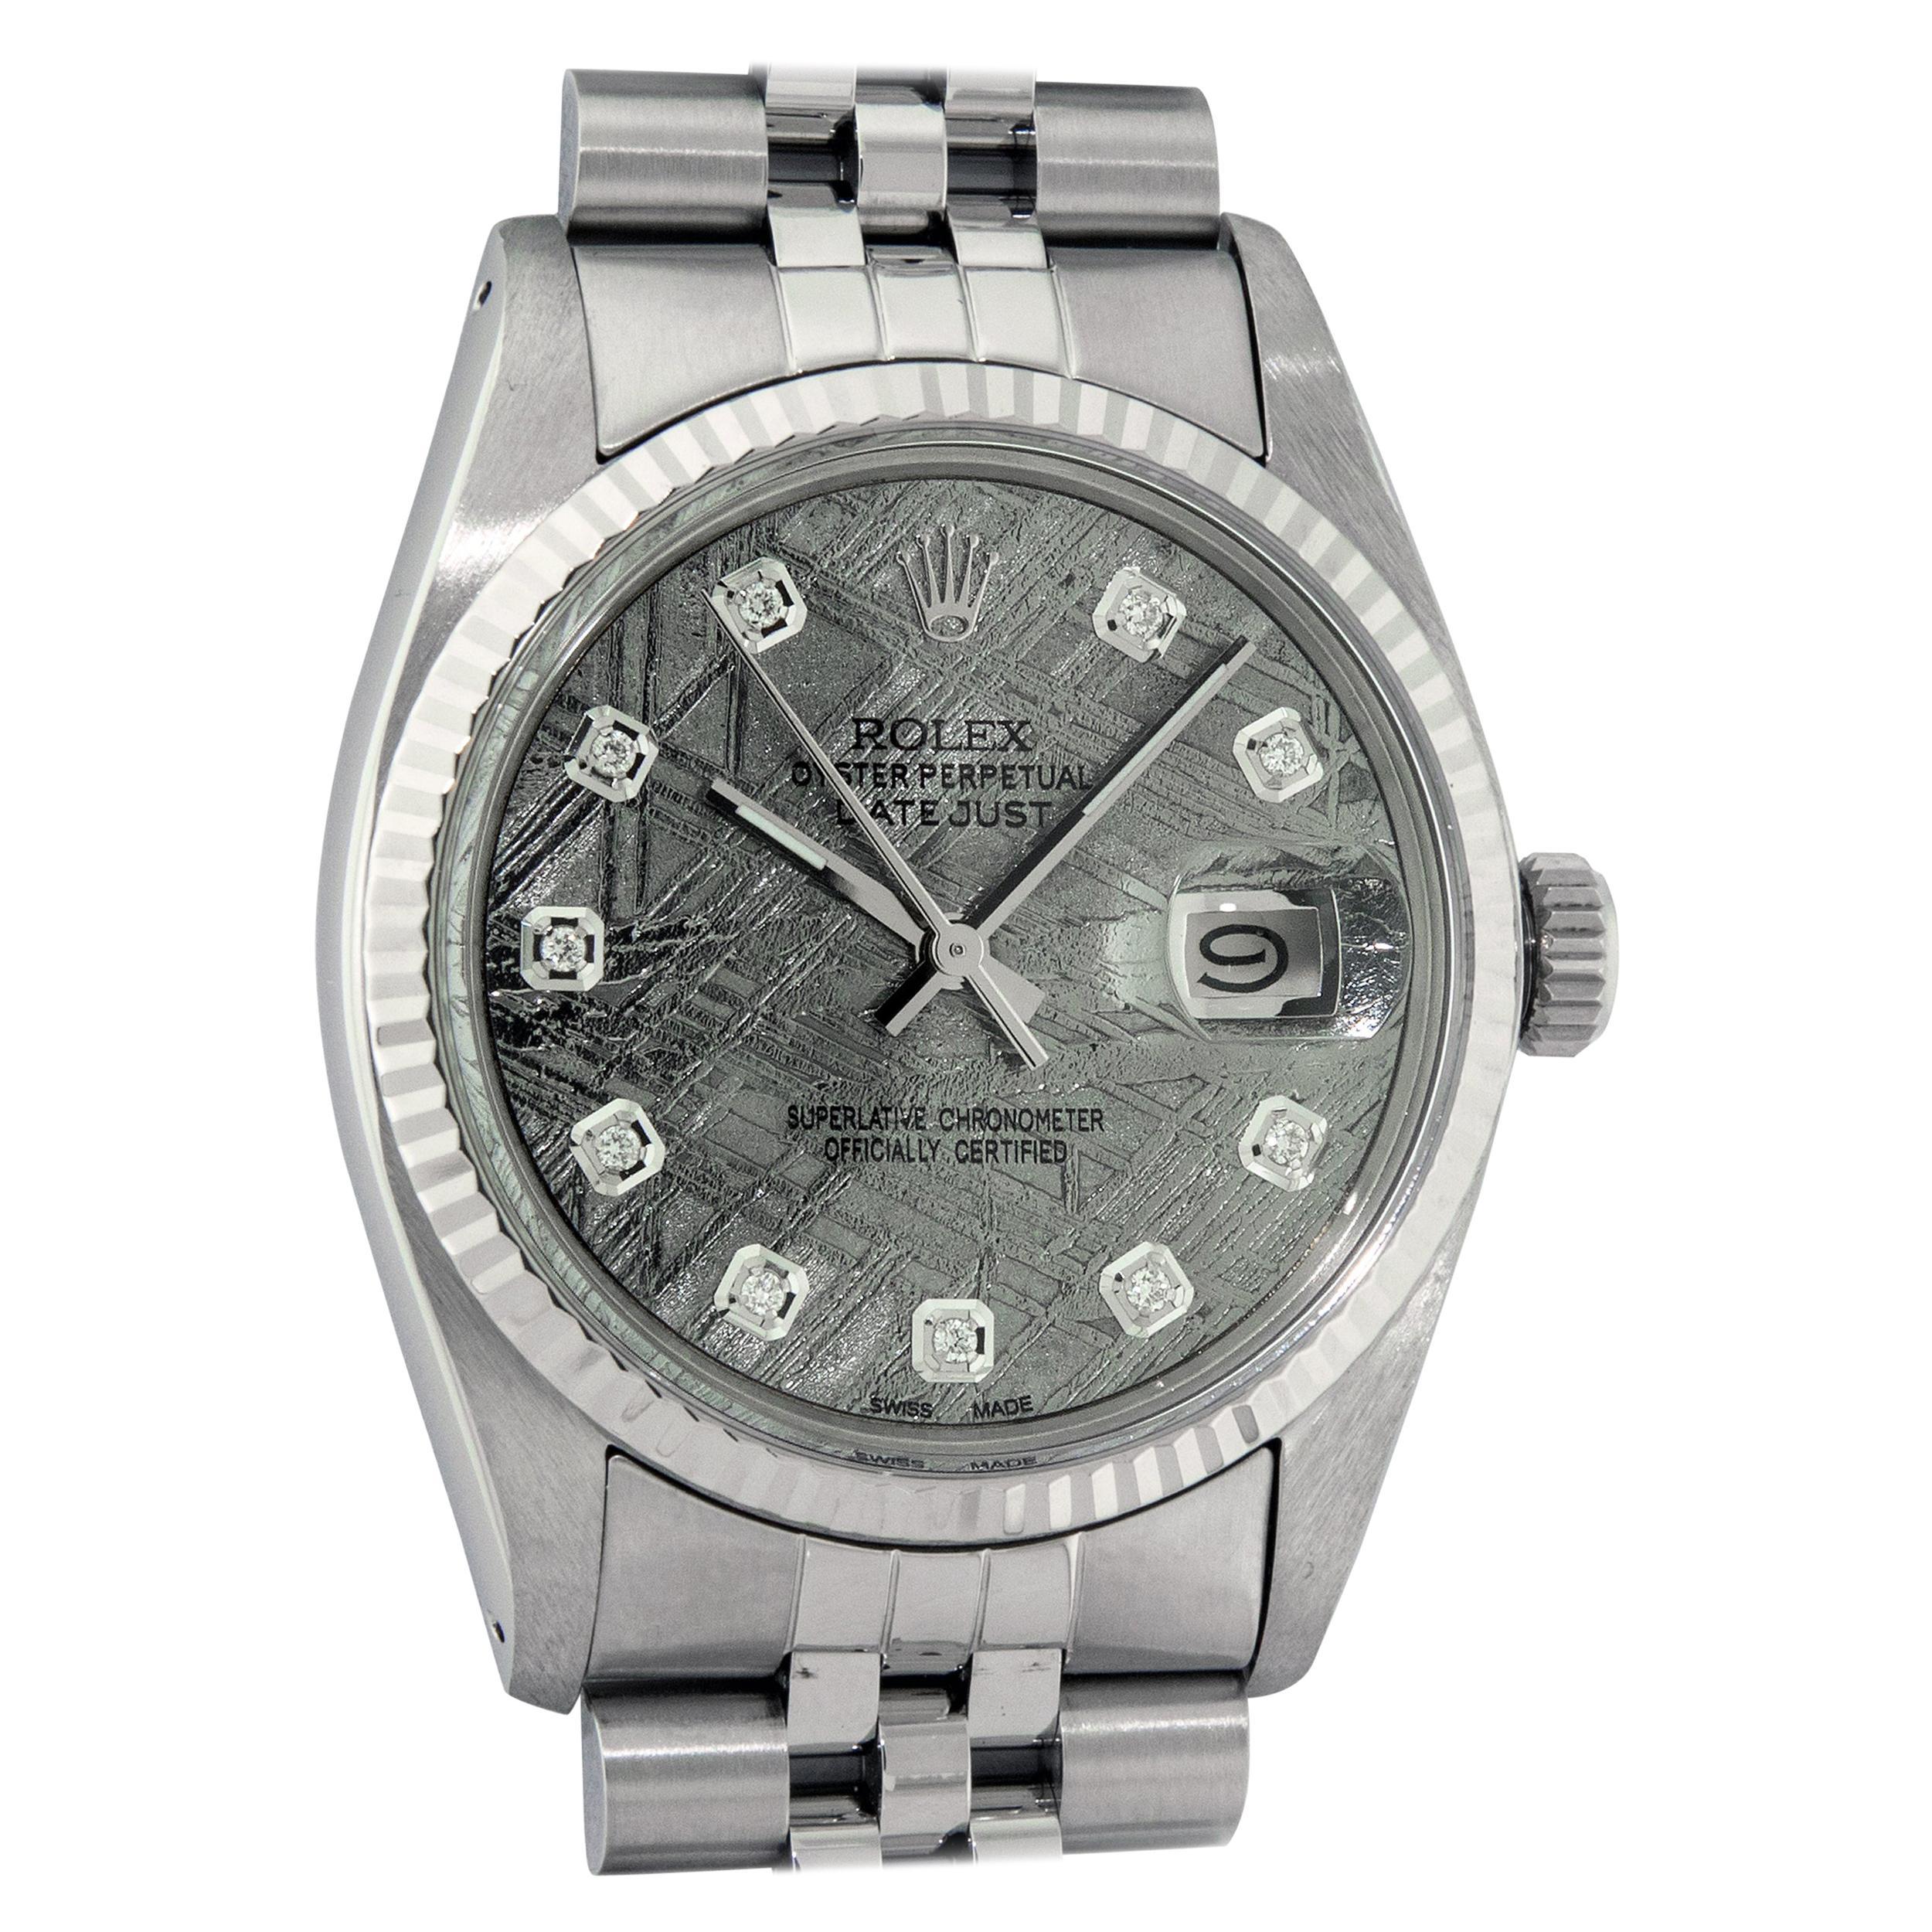 Rolex Men's Datejust Meteorite Diamond Dial Wristwatch with Rolex Box, Appraisal